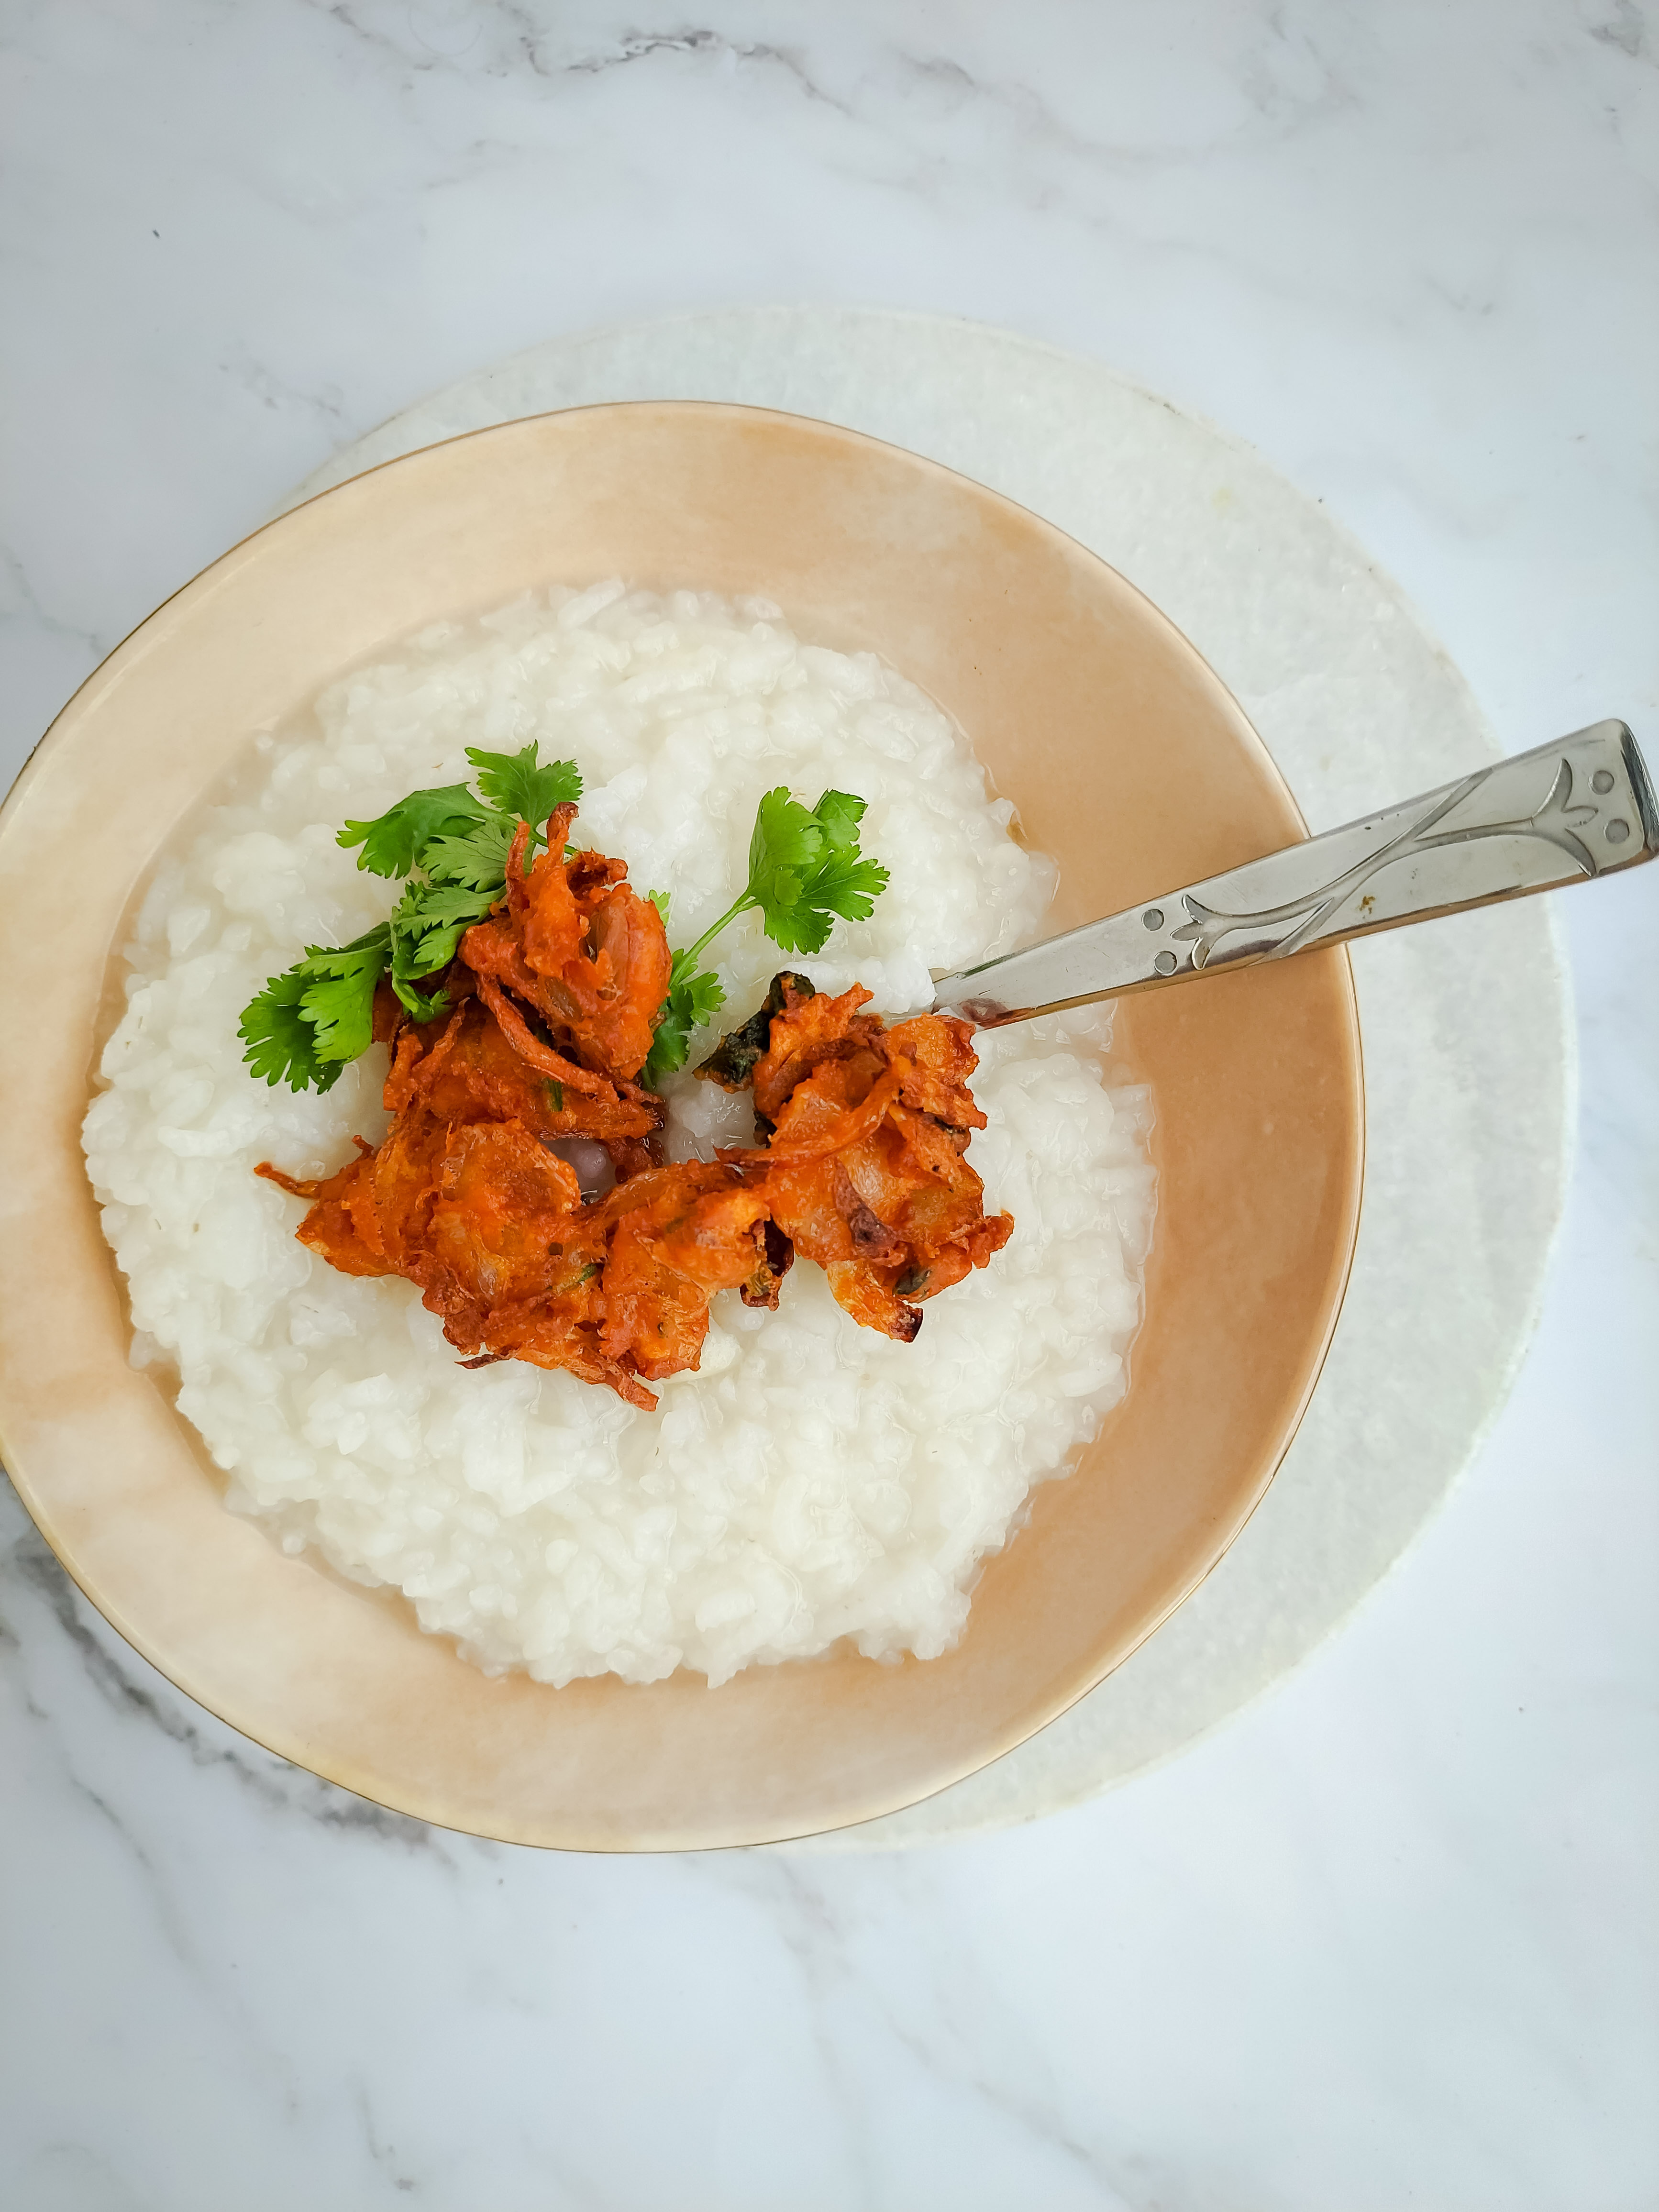 Congee with onion Pakoda- Kanji from leftover rice